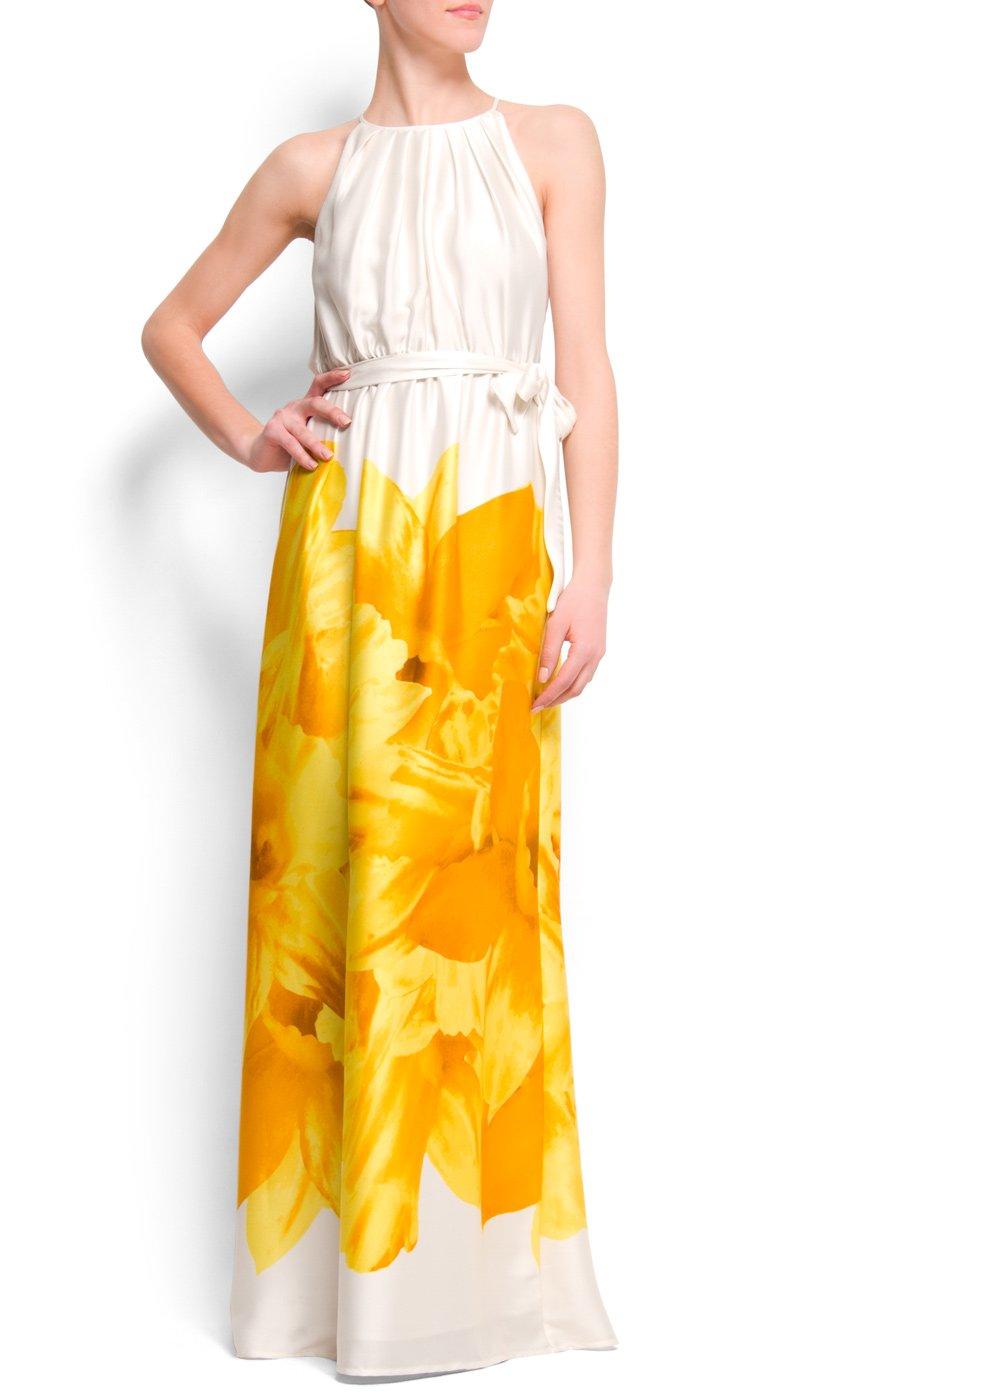 Fantastic Home Clothing Women Clothing Dresses MANGO Dresses